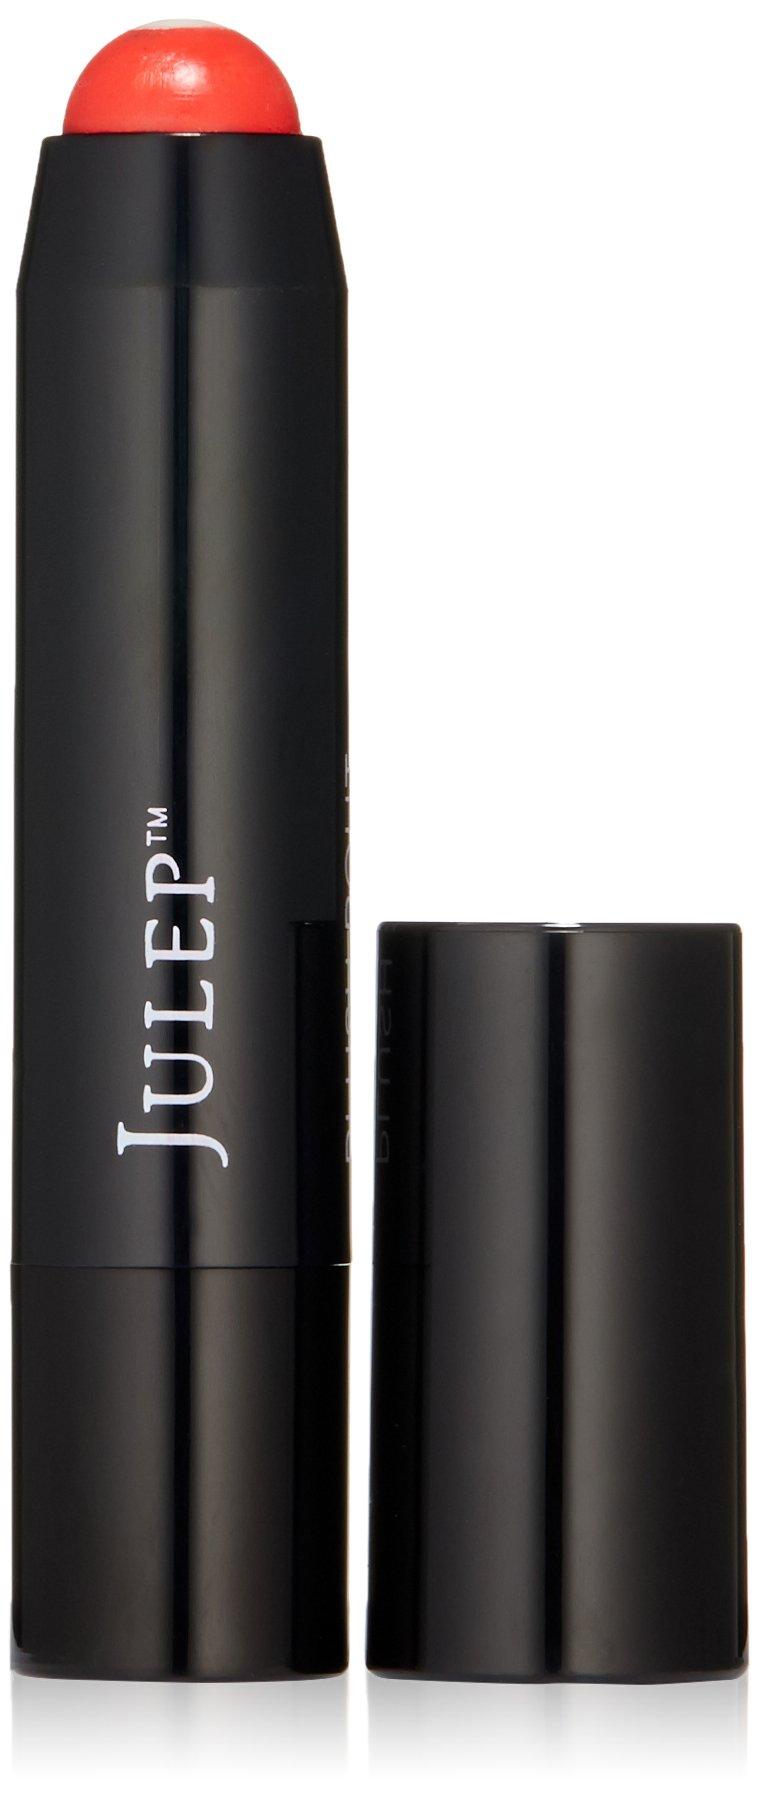 Julep It's Balm Plush Pout Full-Coverage Lip Crayon, Electric Coral